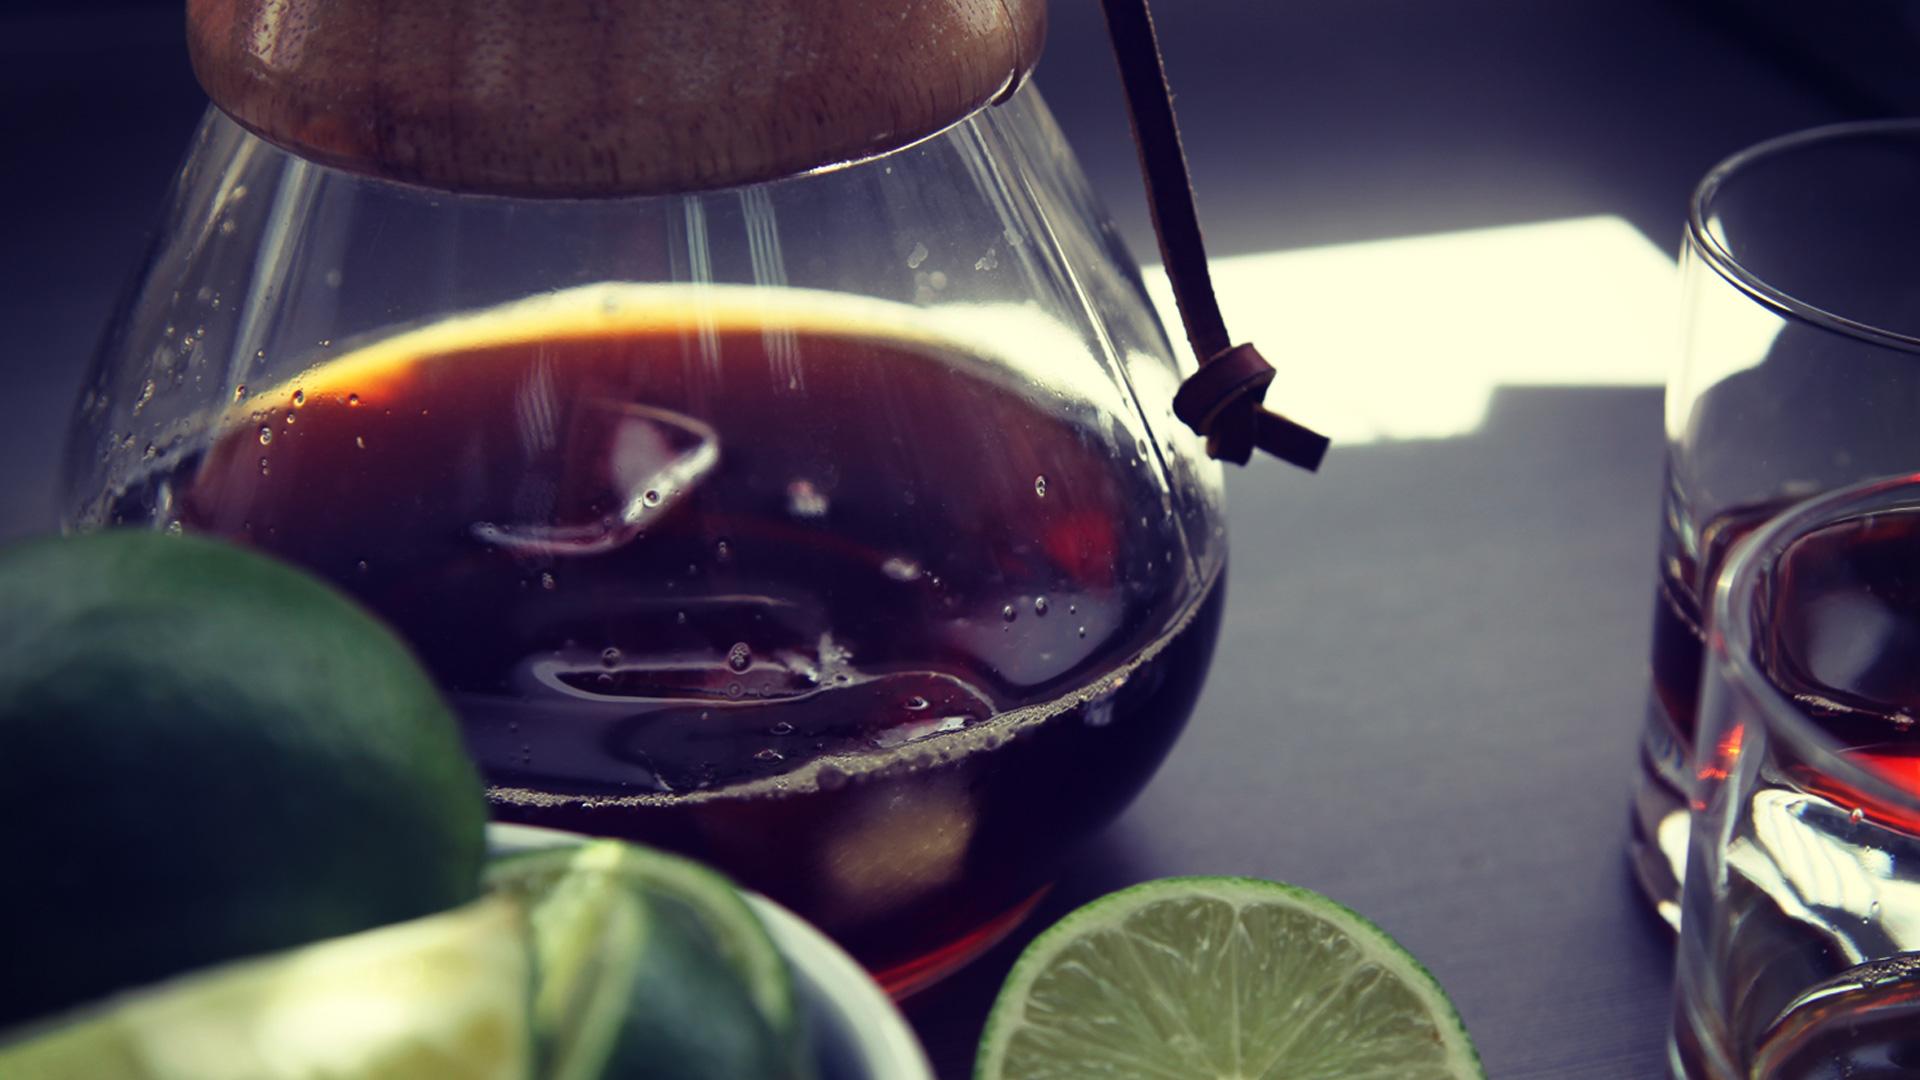 00-Soyuz-Coffee-Roasting